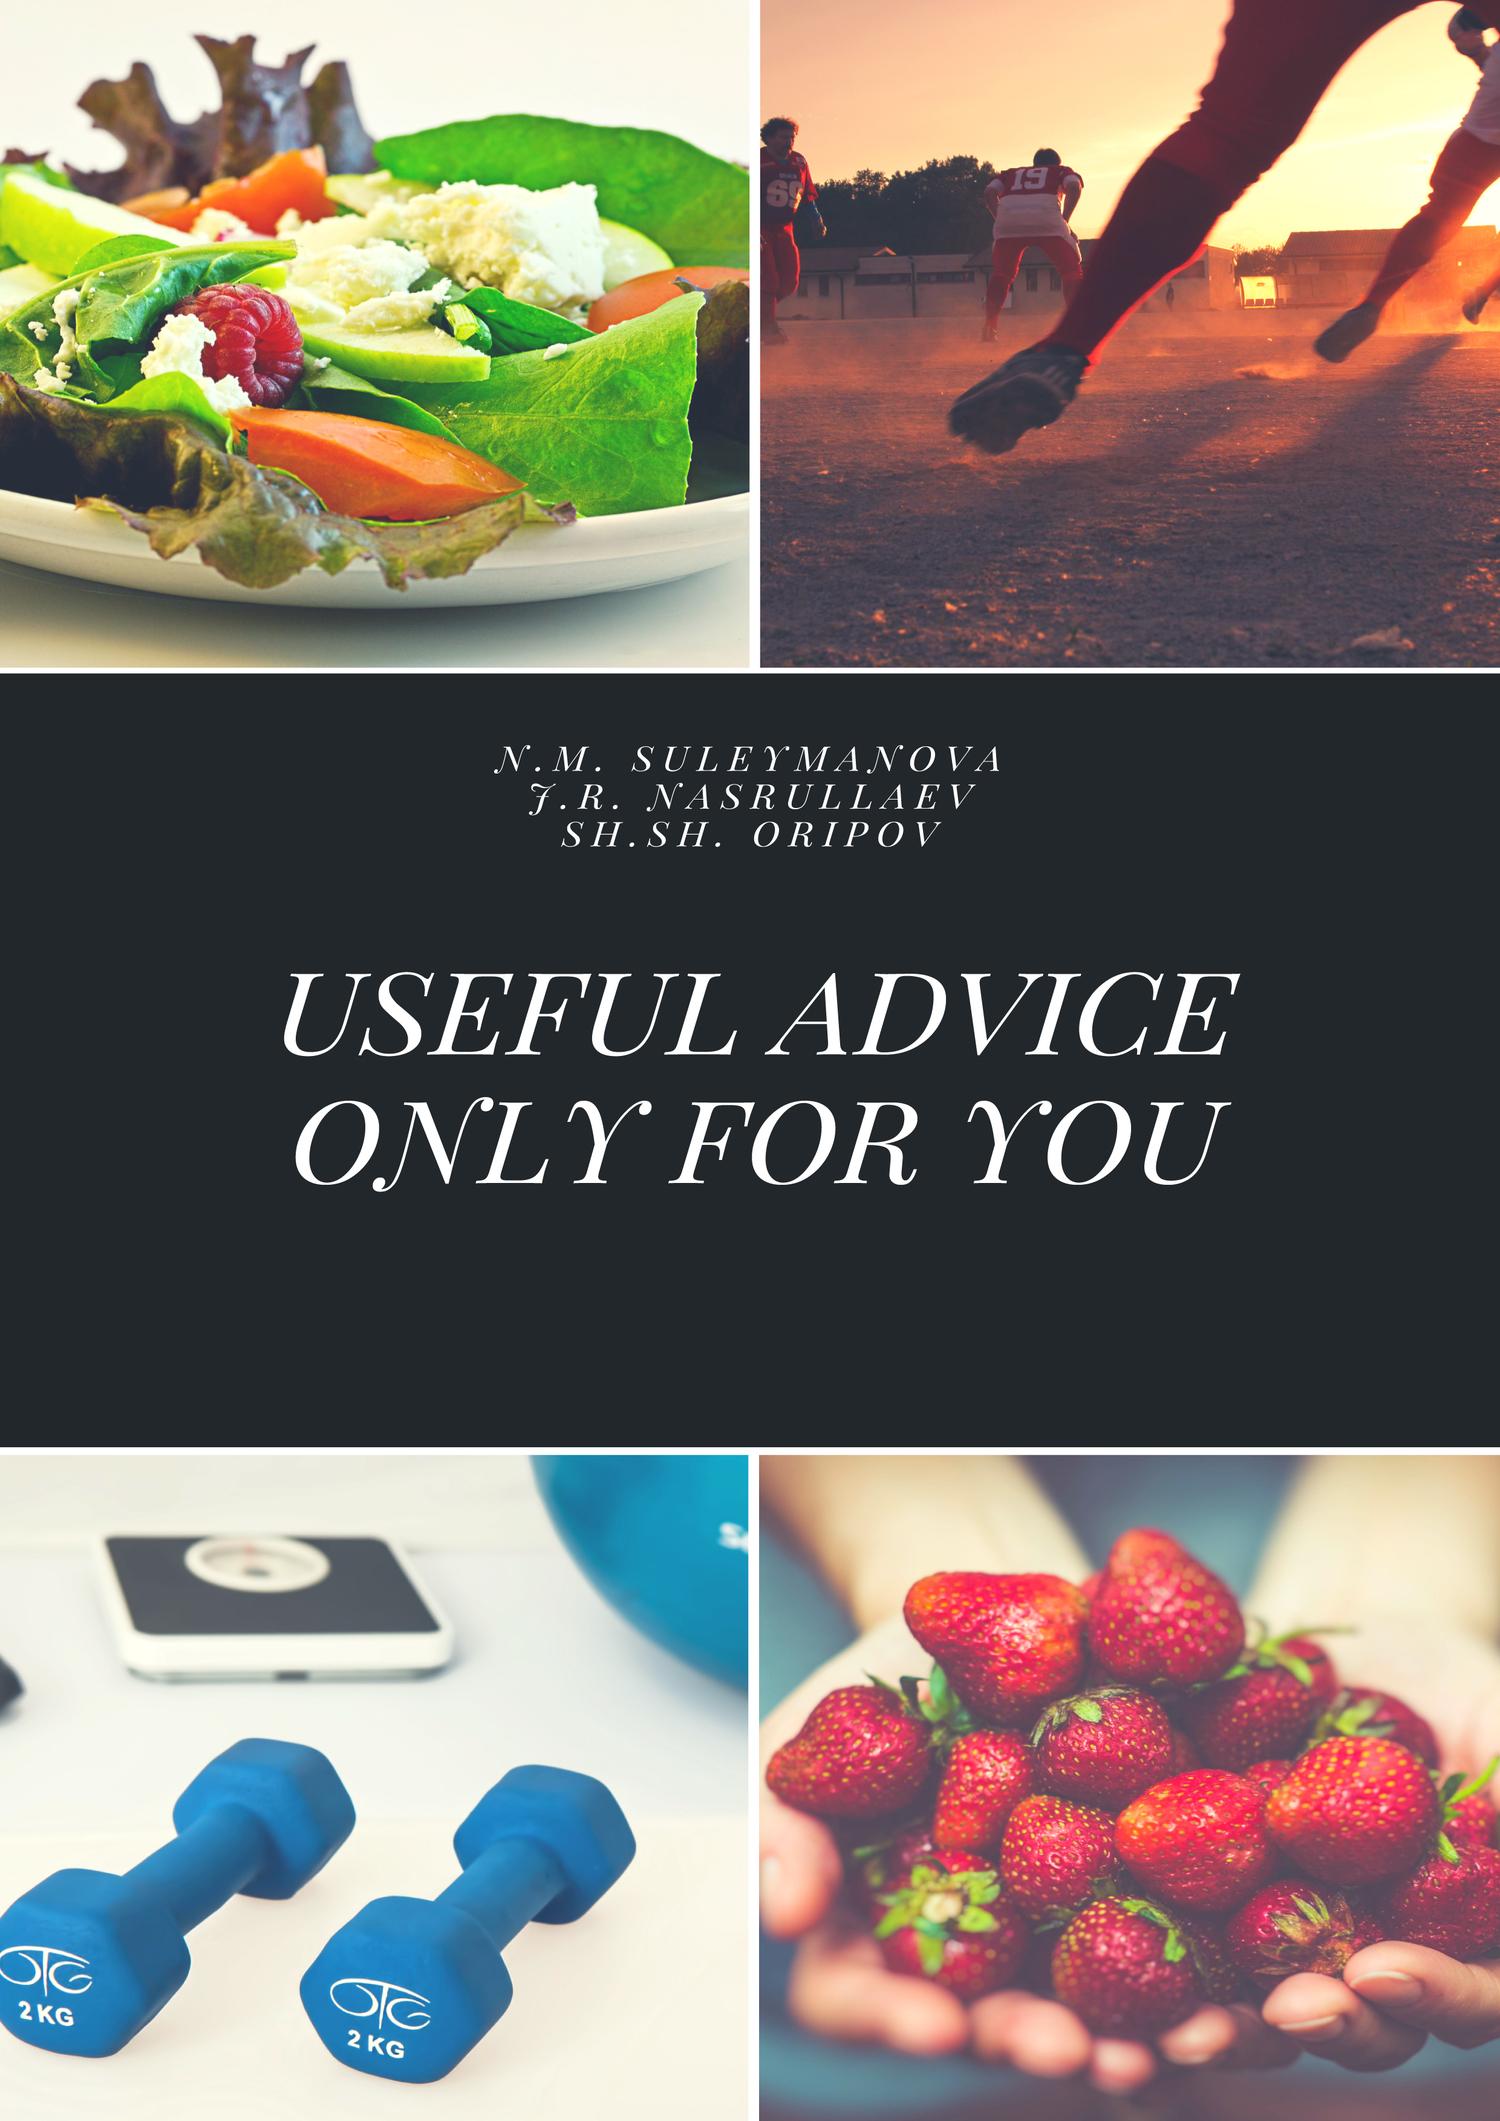 Н. М. Сулейманова Useful advice only for you ISBN: 978-5-00118-056-2